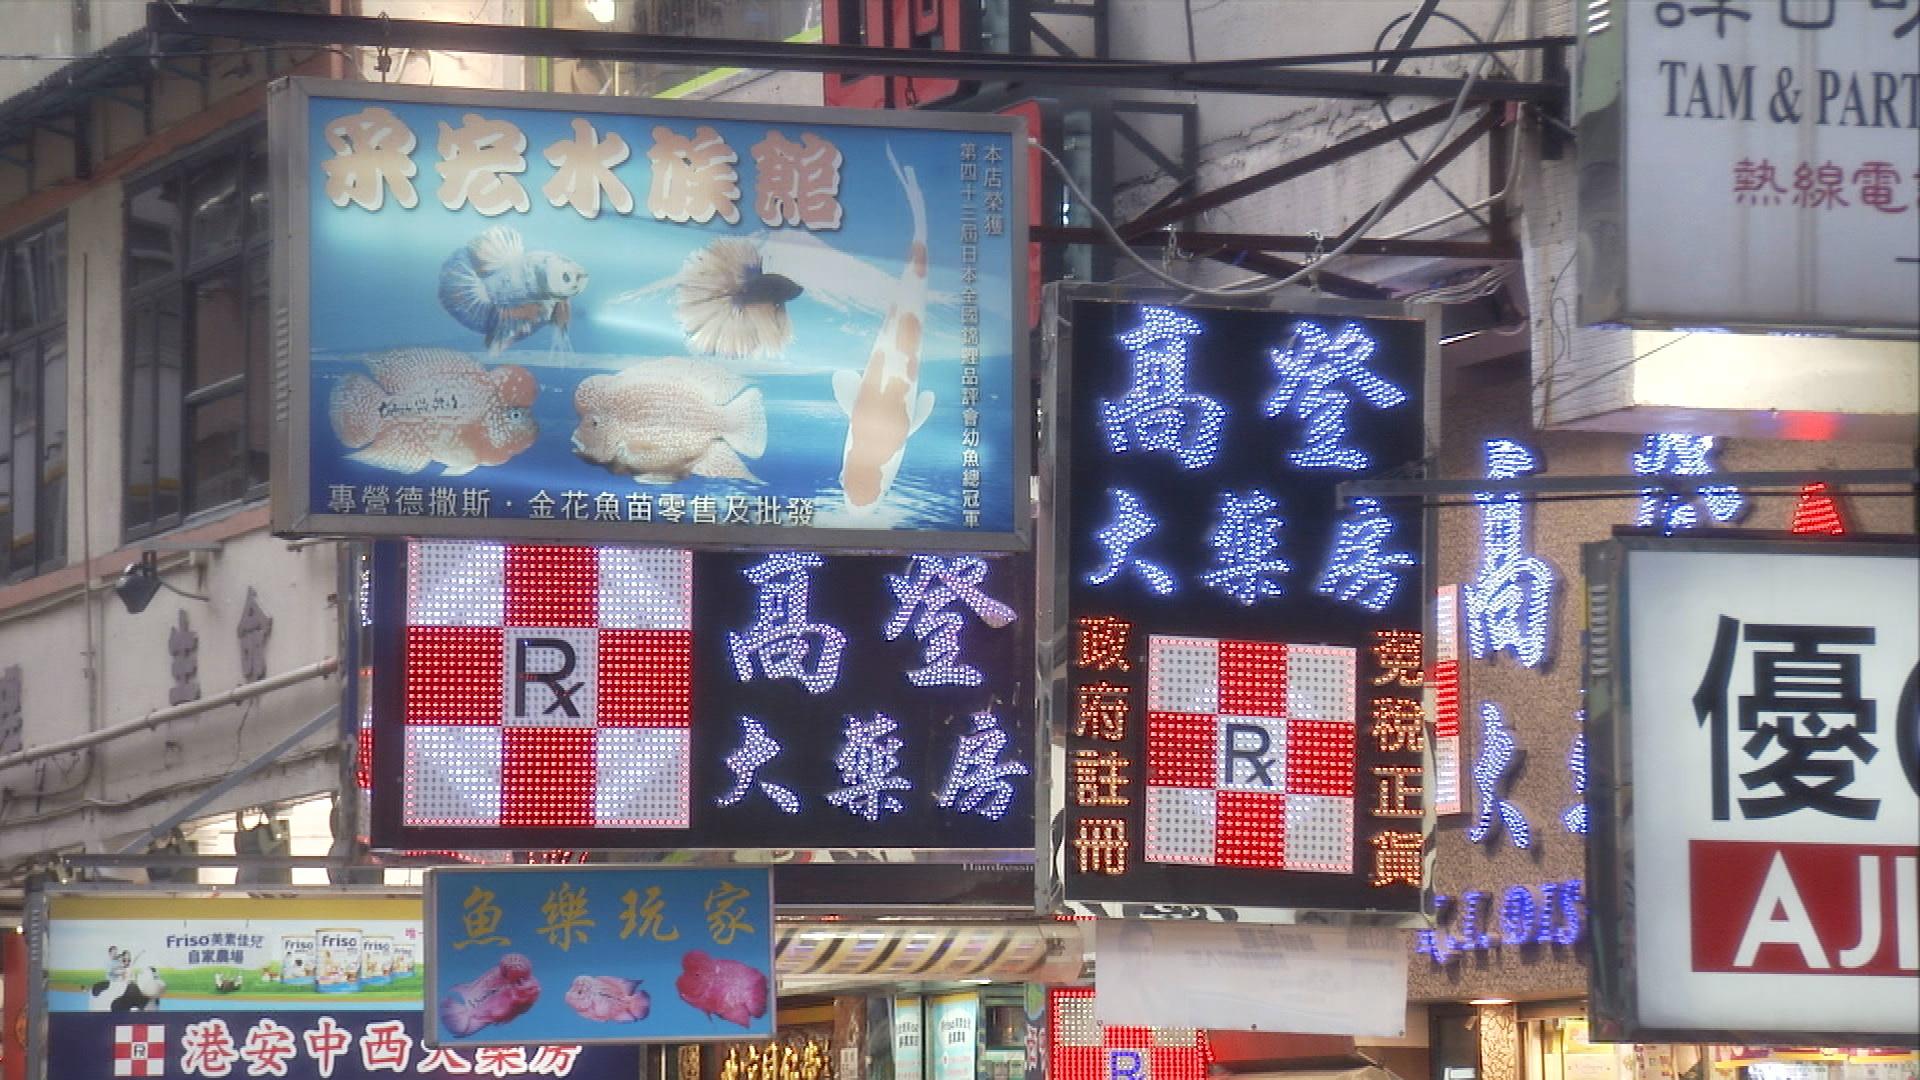 HÔTELS DU MONDE, Macao